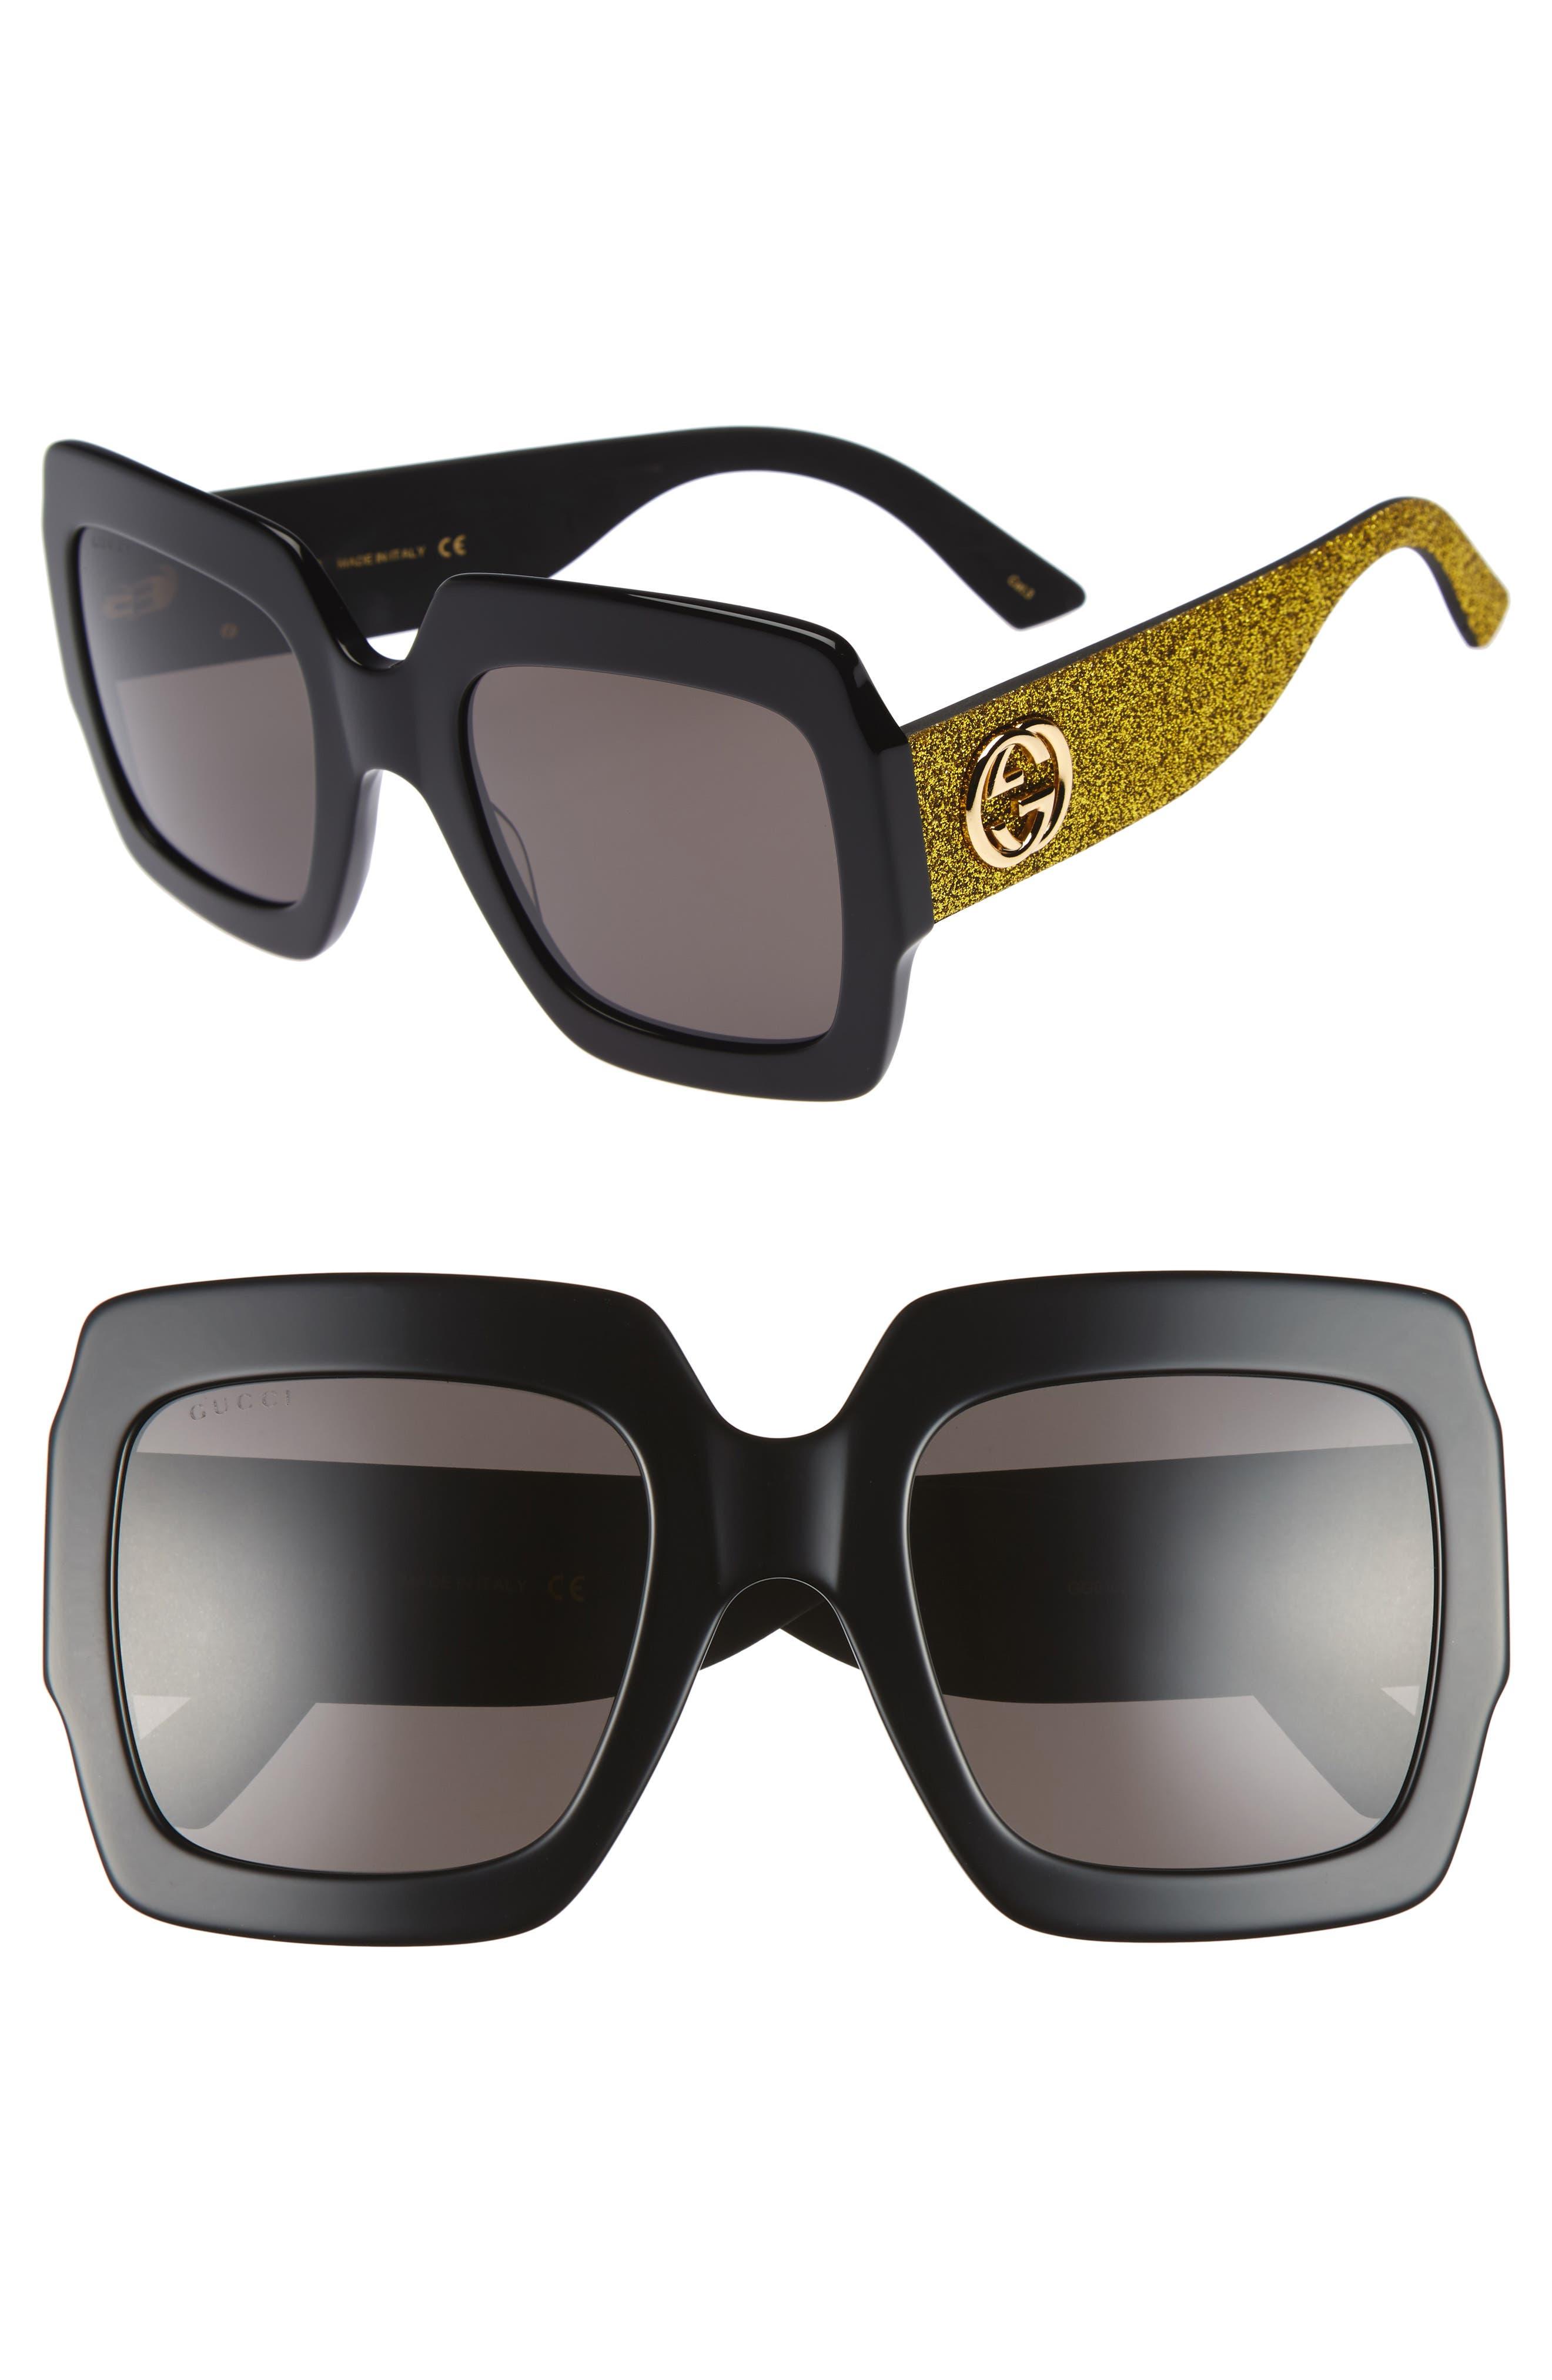 217685f52 Women's Oblong Sunglasses: Gucci   Nordstrom